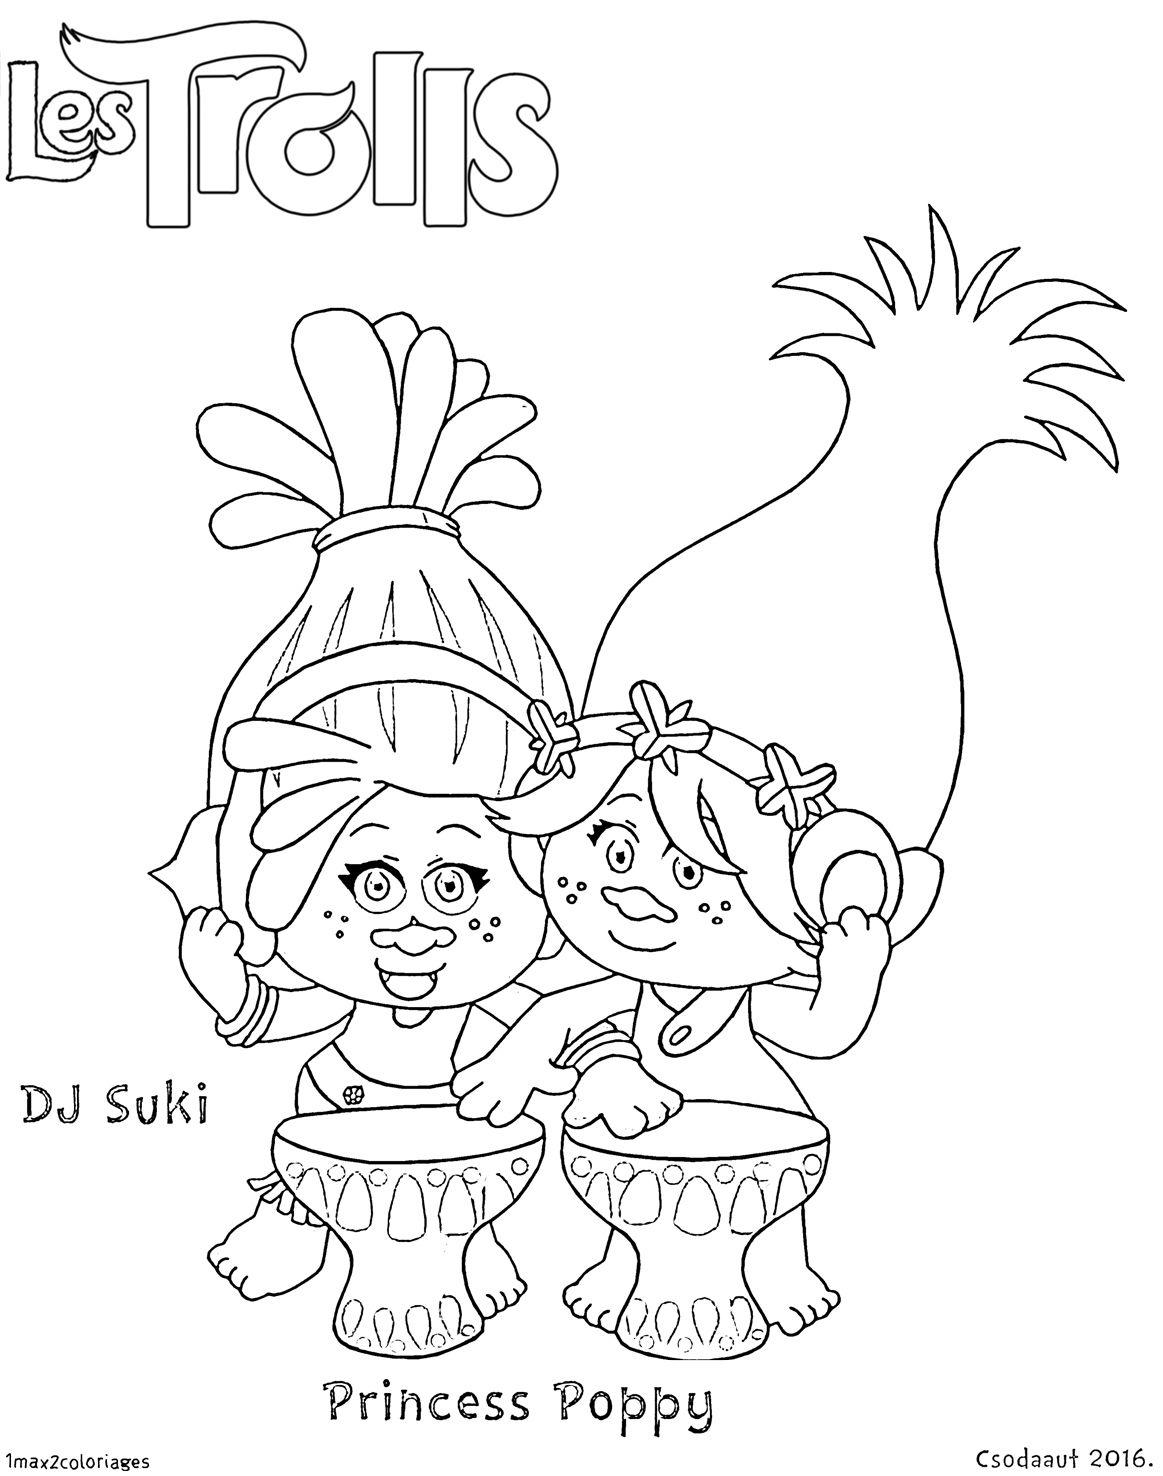 Coloriage dj suki et princesse poppy kolorowanki for Trolls coloring pages dj suki